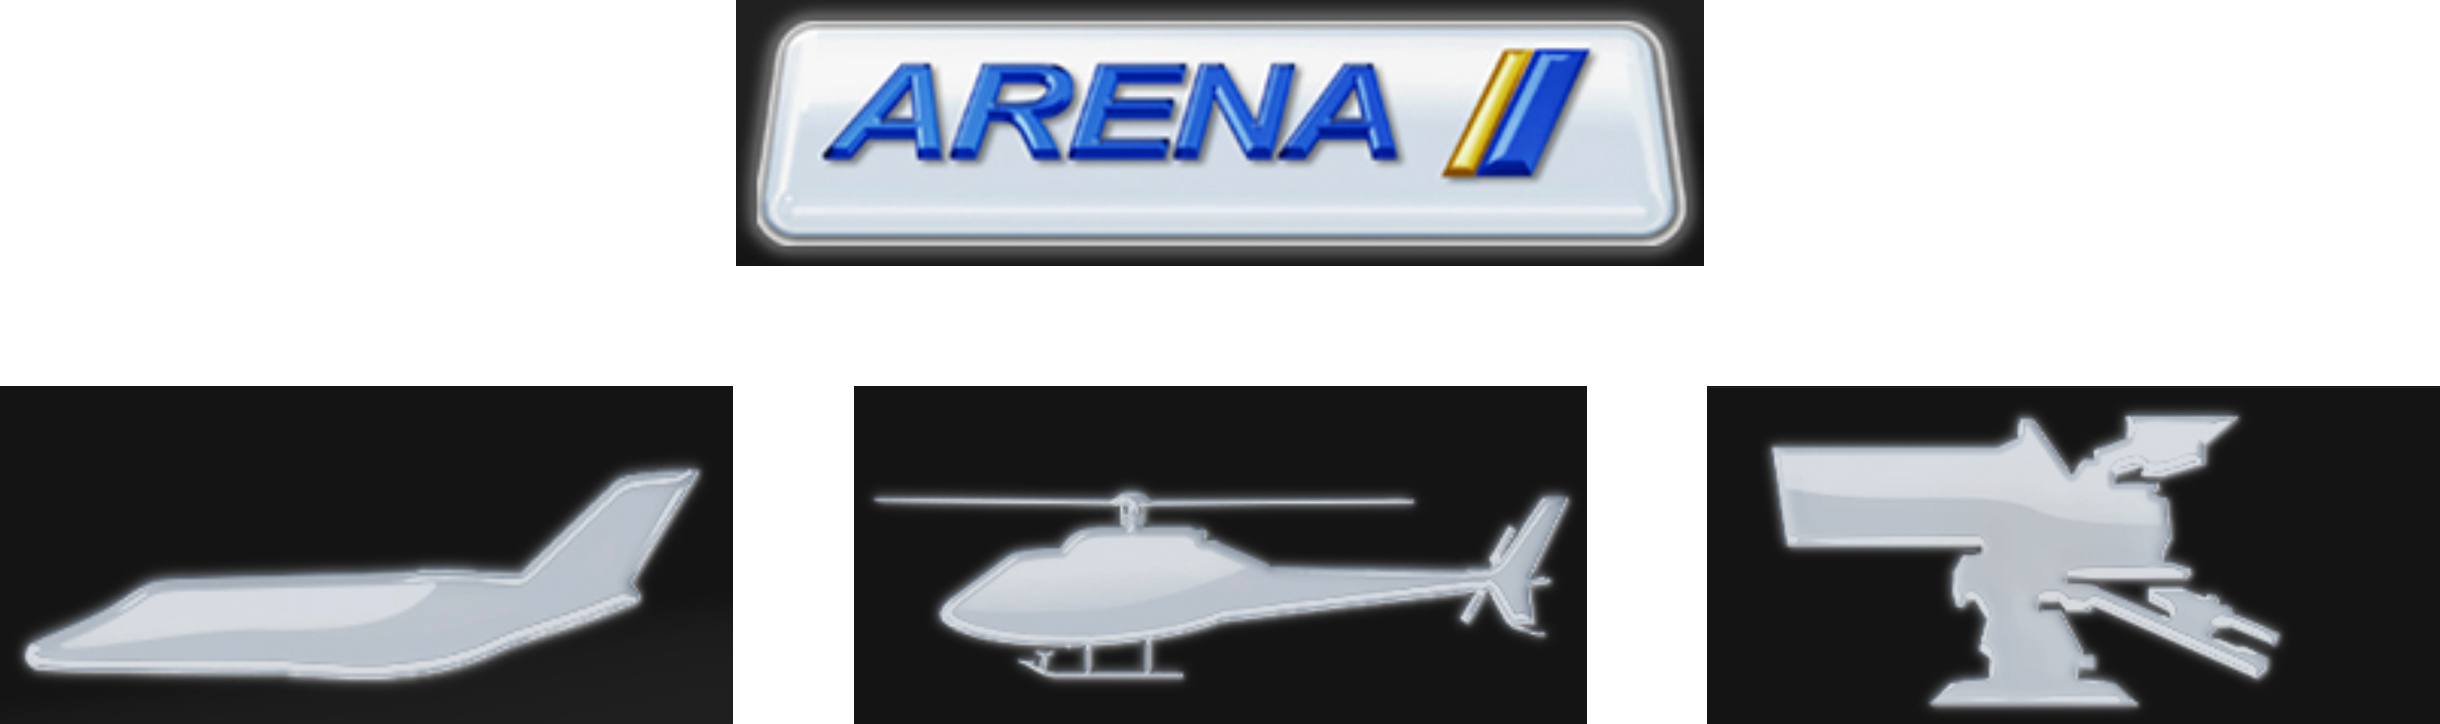 arena-comp